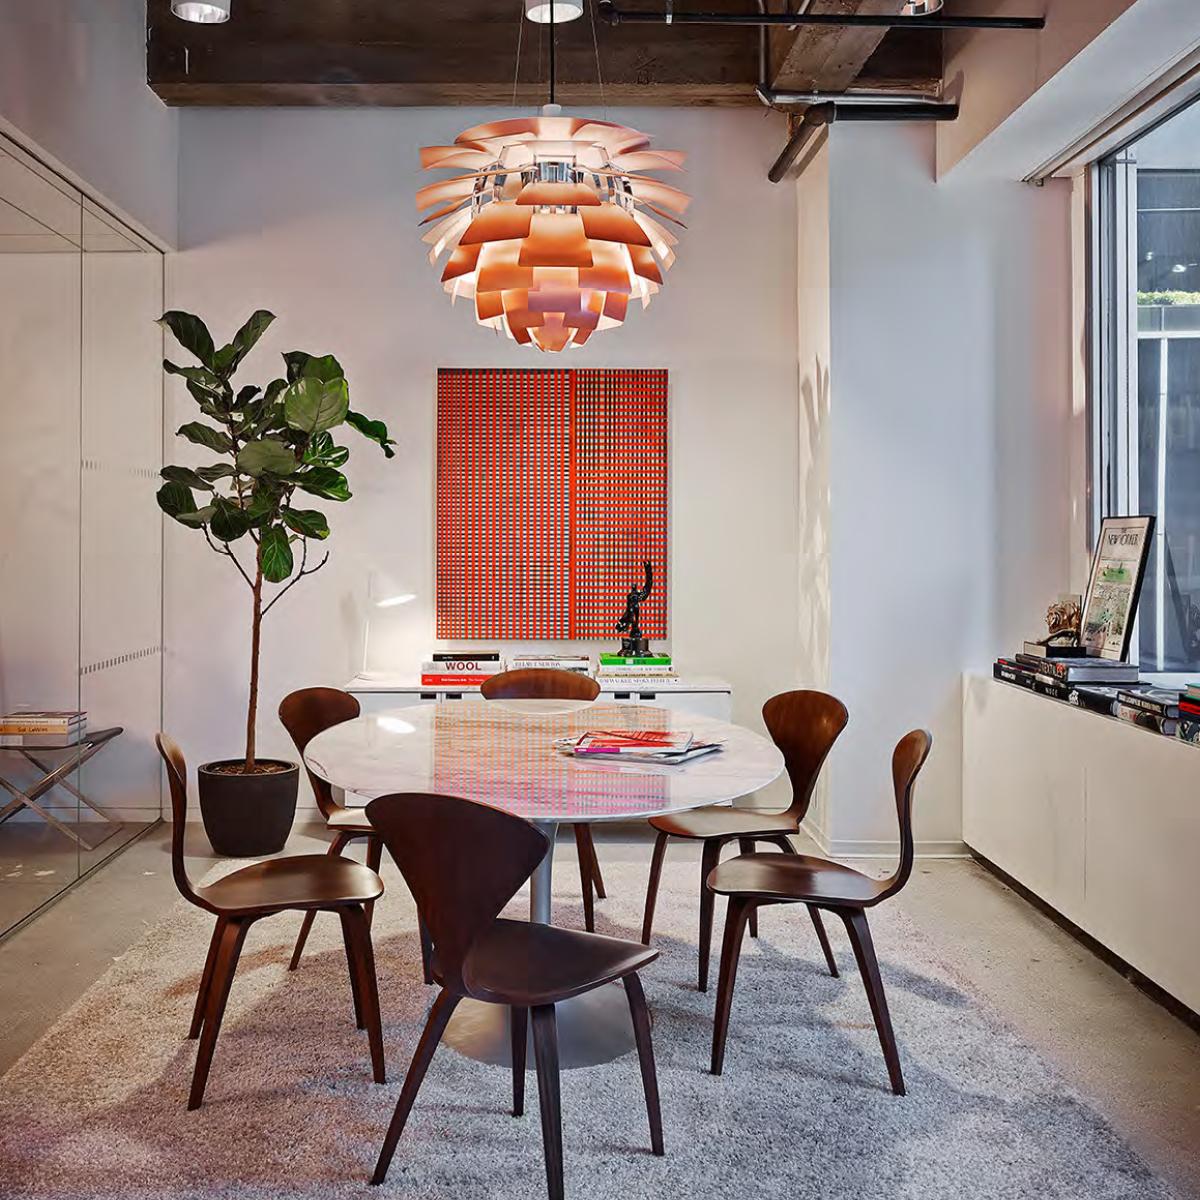 bbdo-new-york-offices-bureaux-agence-publicite-1